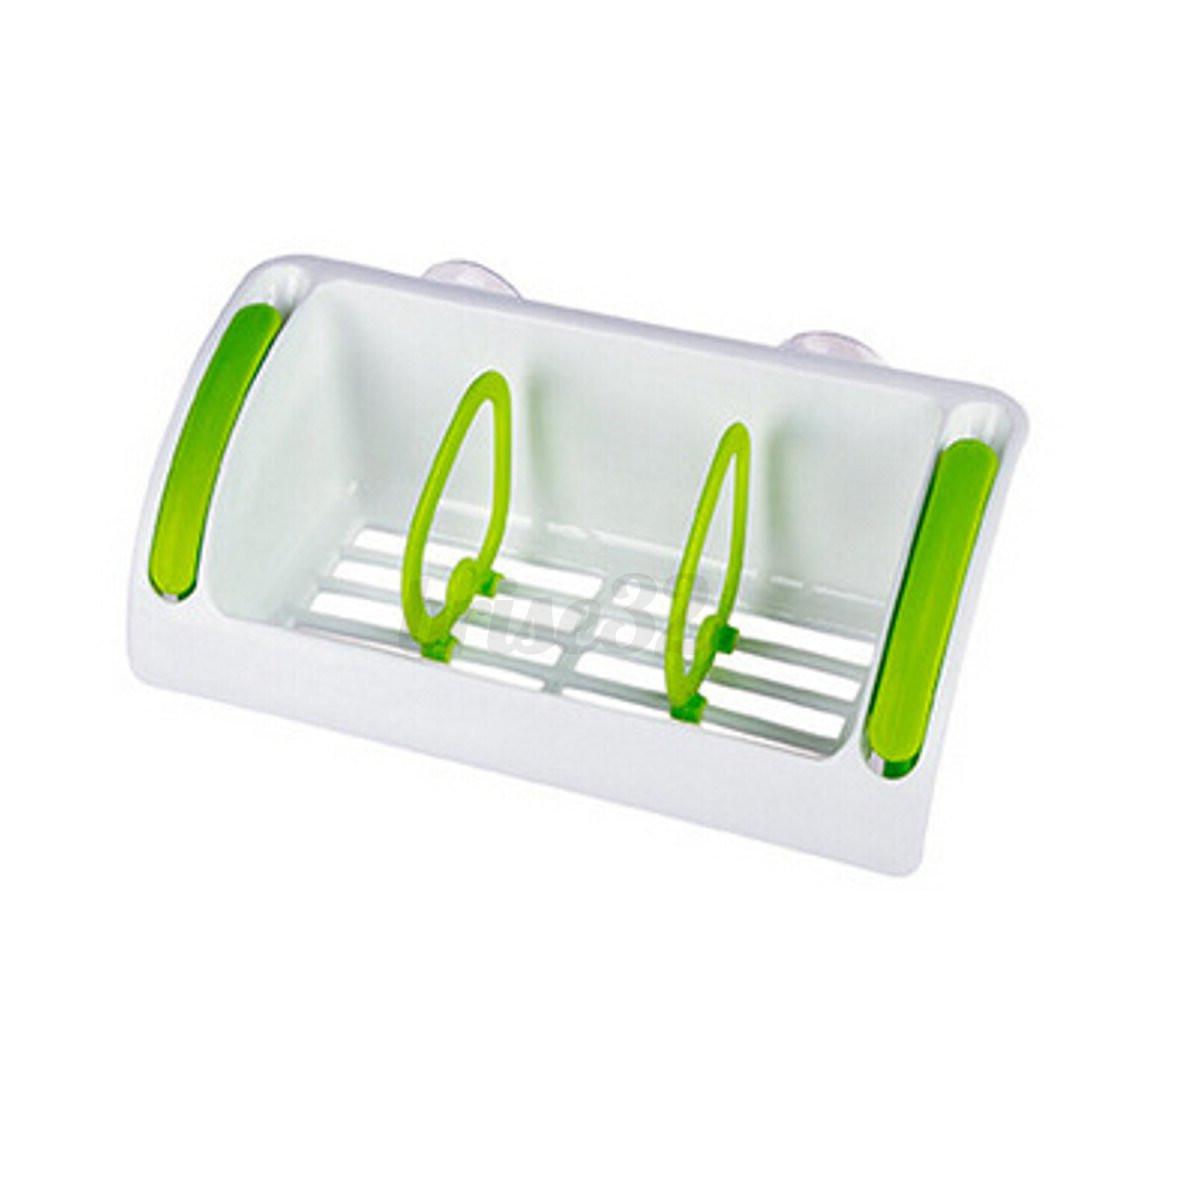 Strong Suction Cup Kitchen Brush Sponge Sink Draining Towel Rack Washing Holder